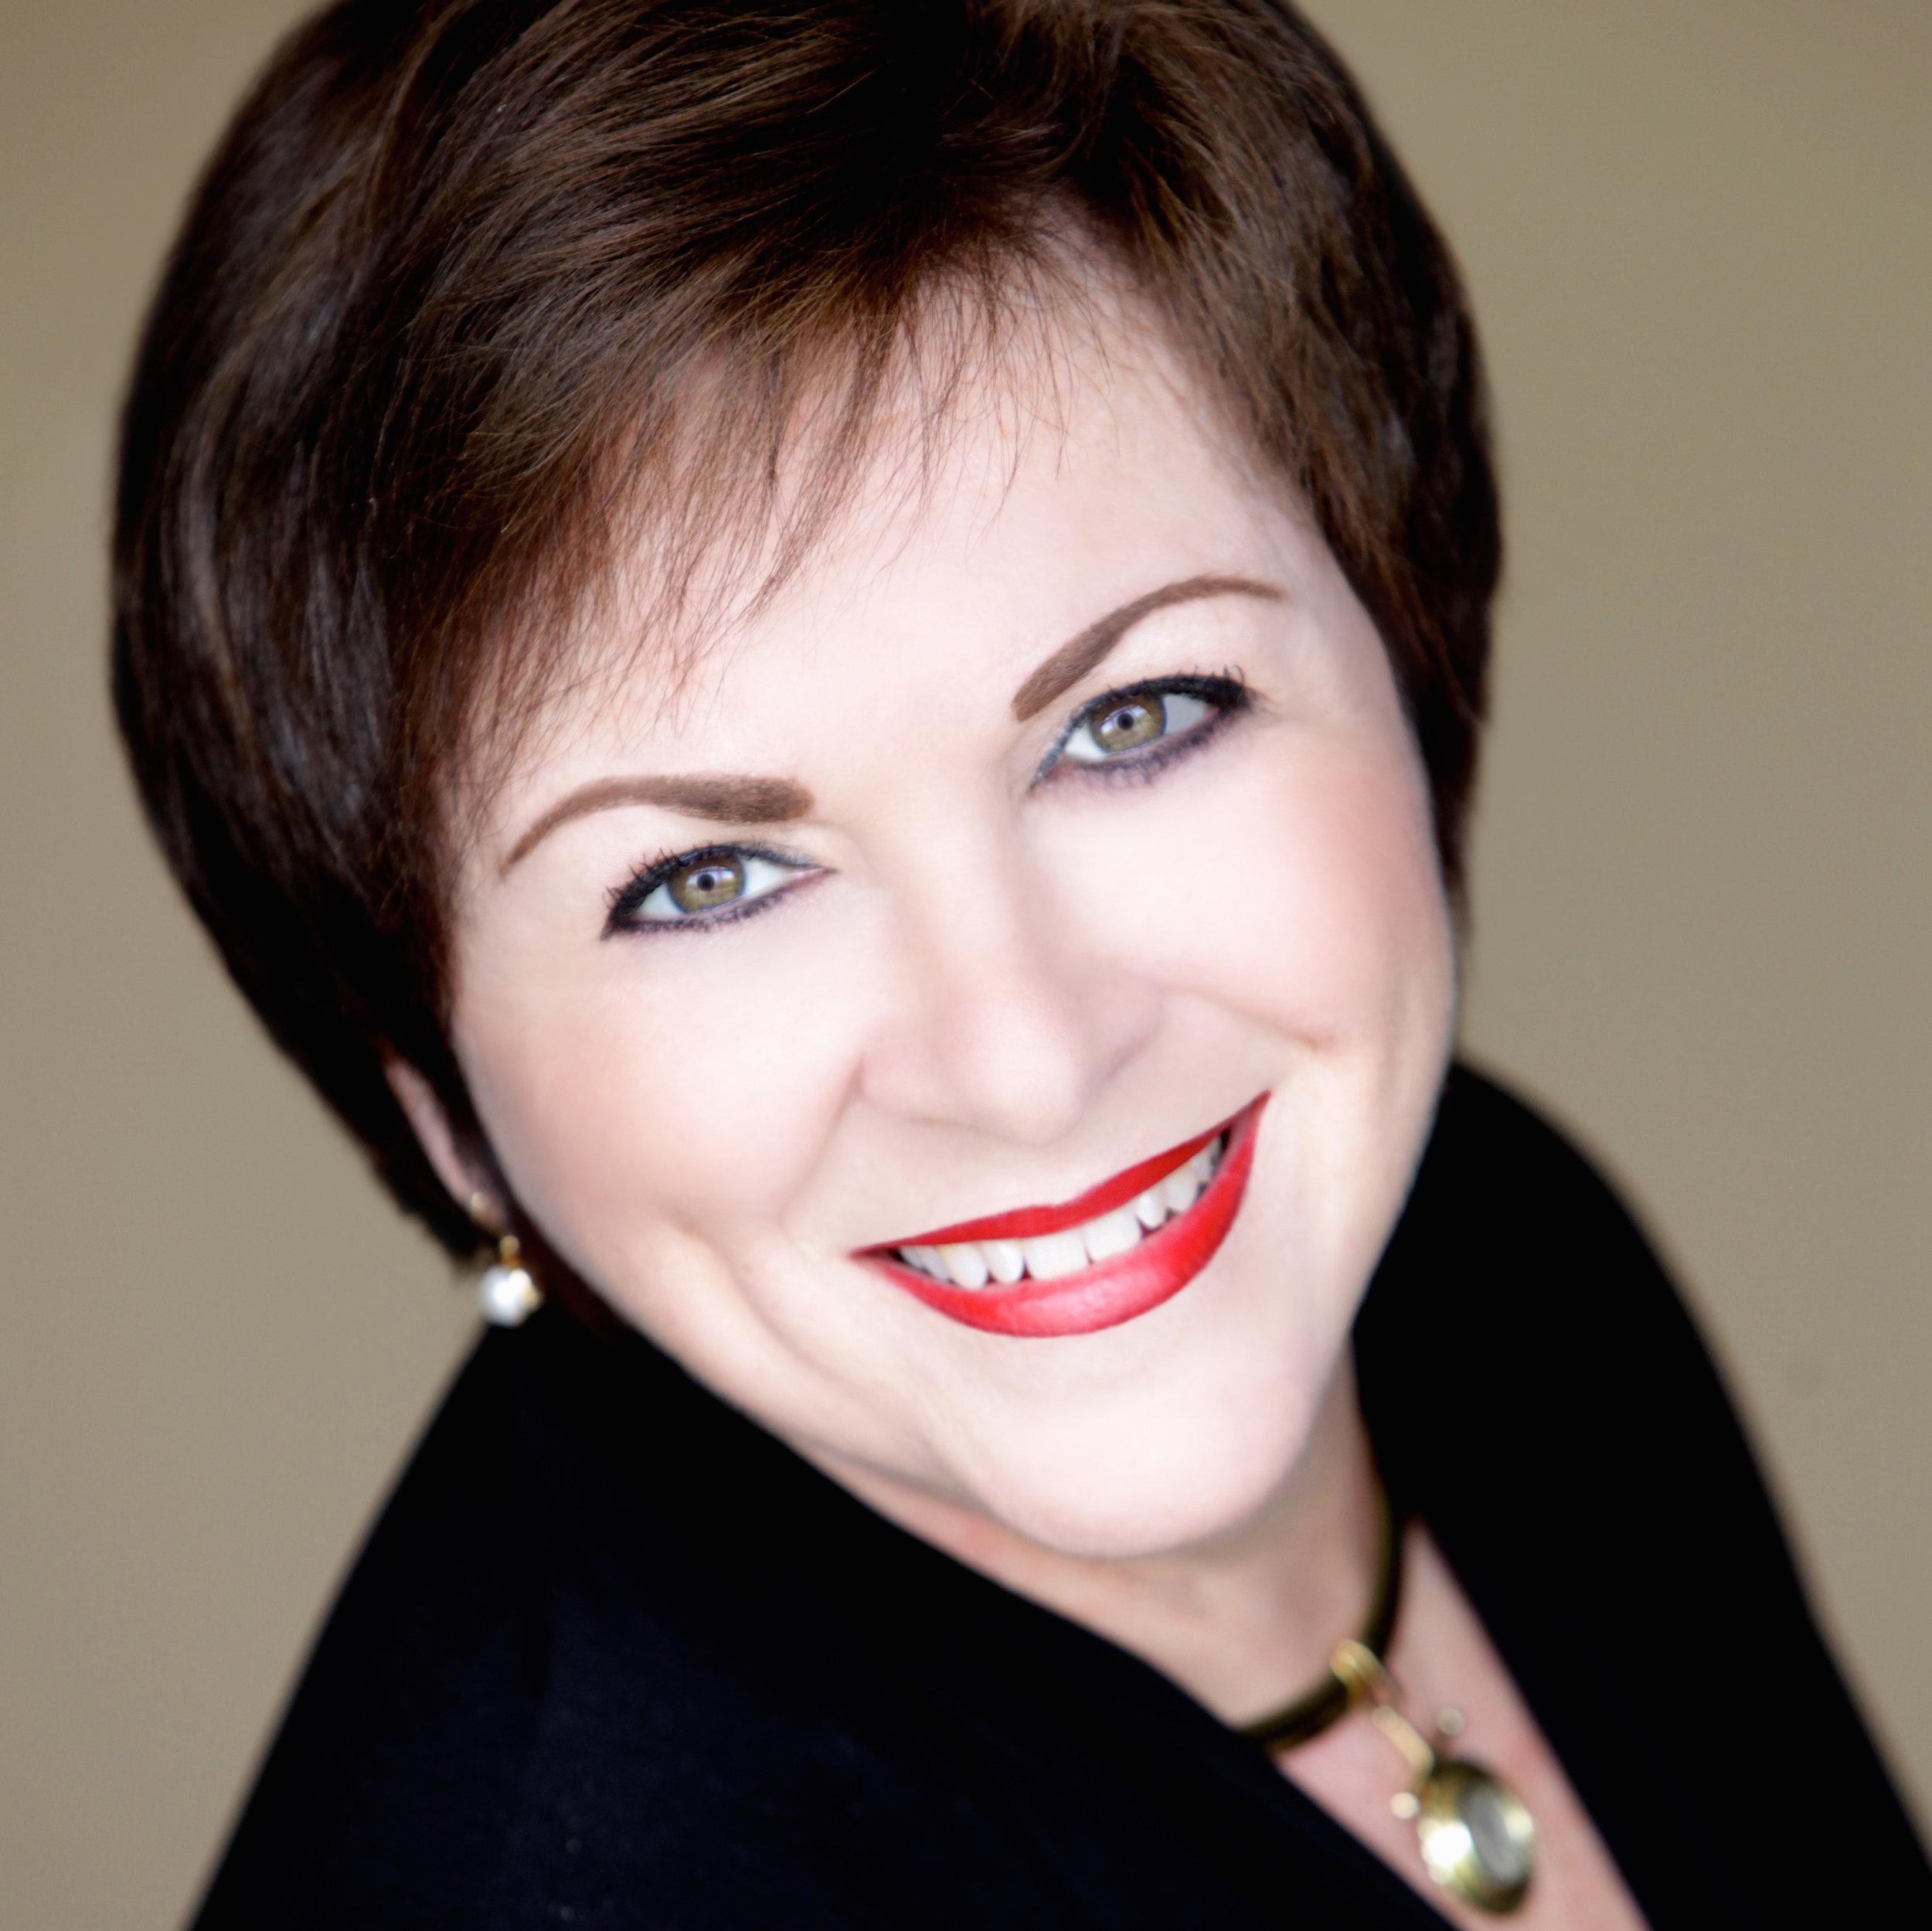 Promo Photo of Claudia Cantrell -Dan Carmody, Studio 7